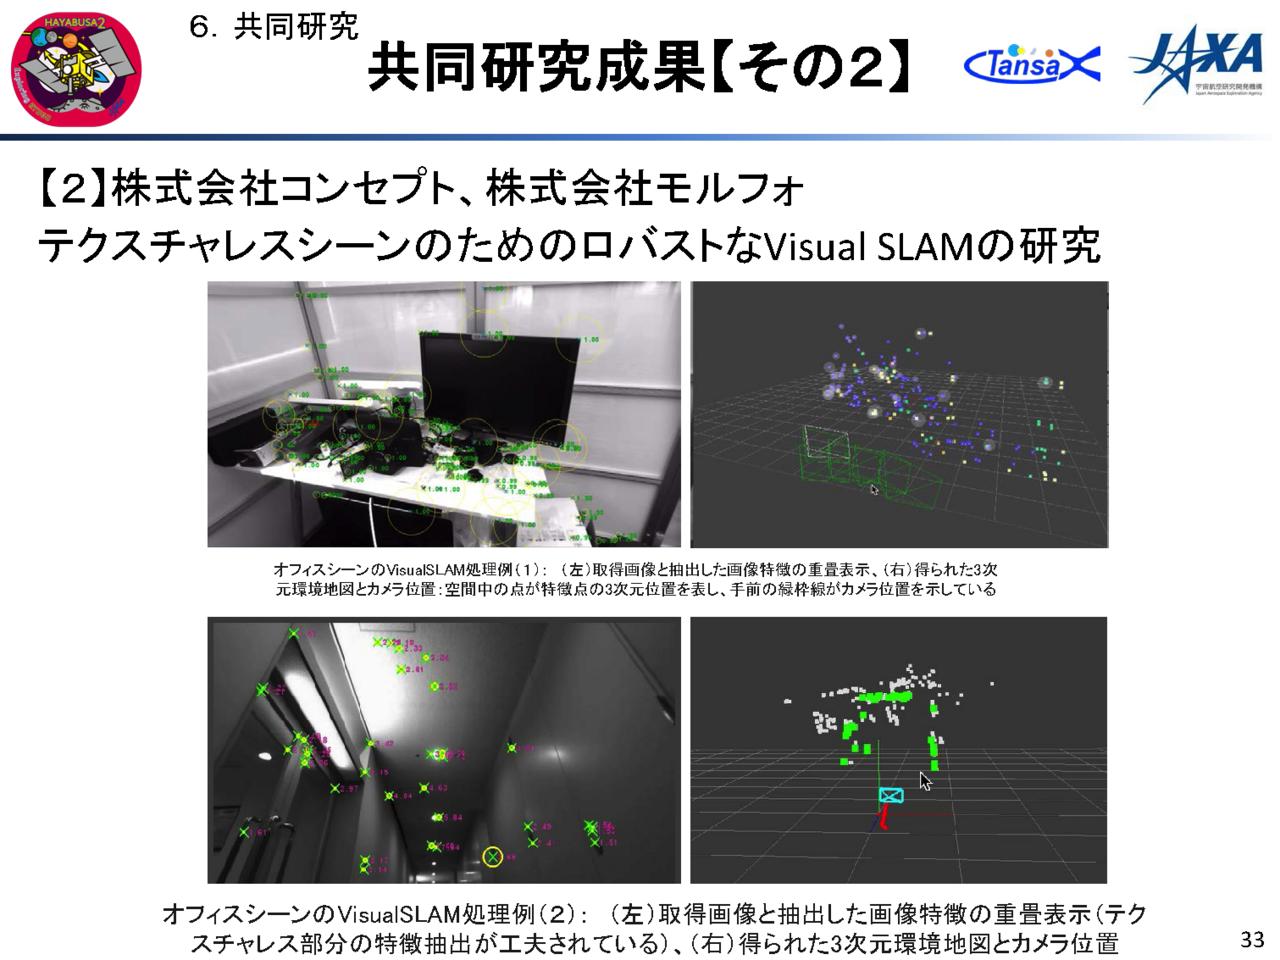 f:id:Imamura:20180802145953p:plain